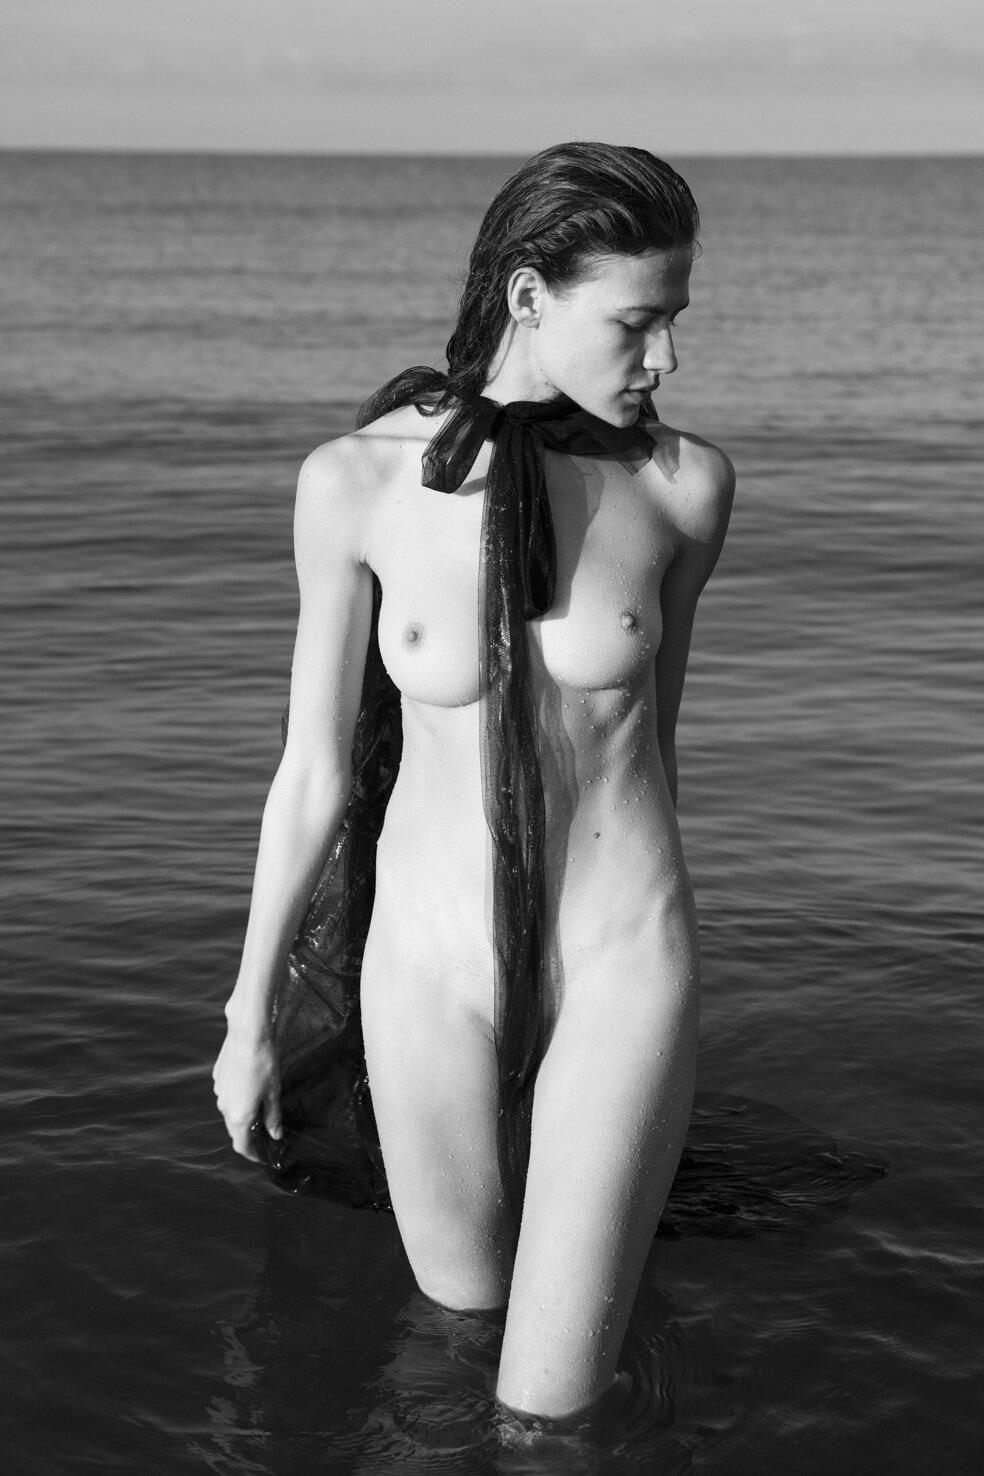 Polina Grosheva - Pino Leone photoshoot